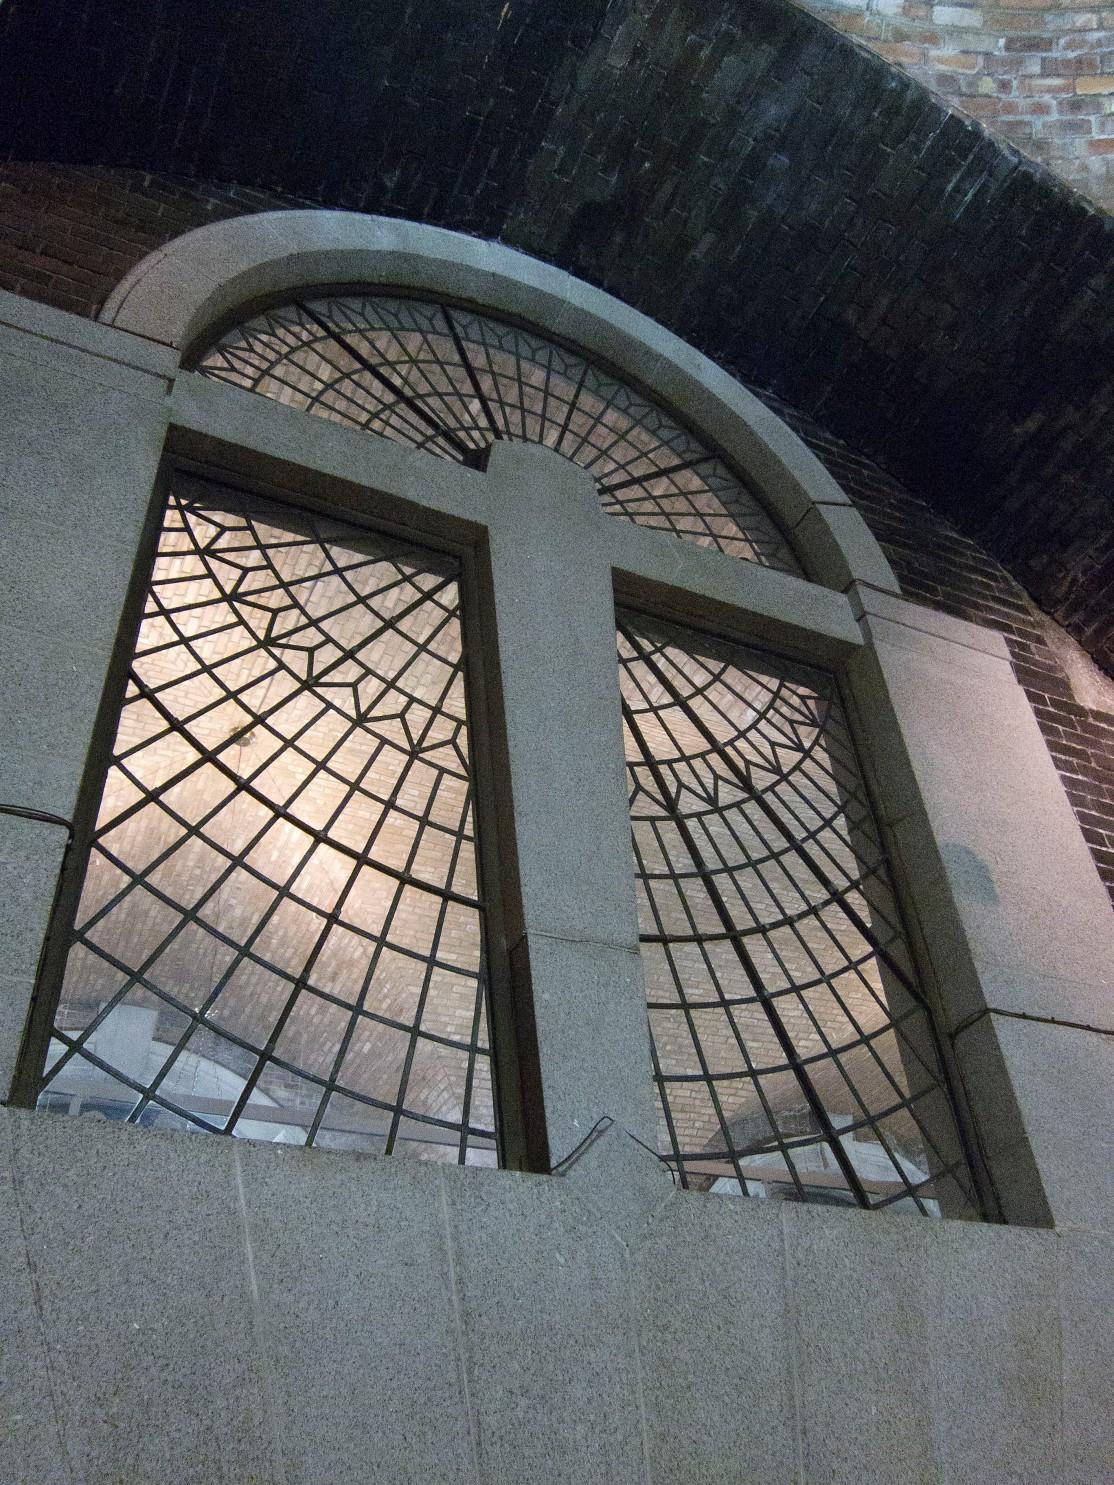 Liverpool CAMRA window